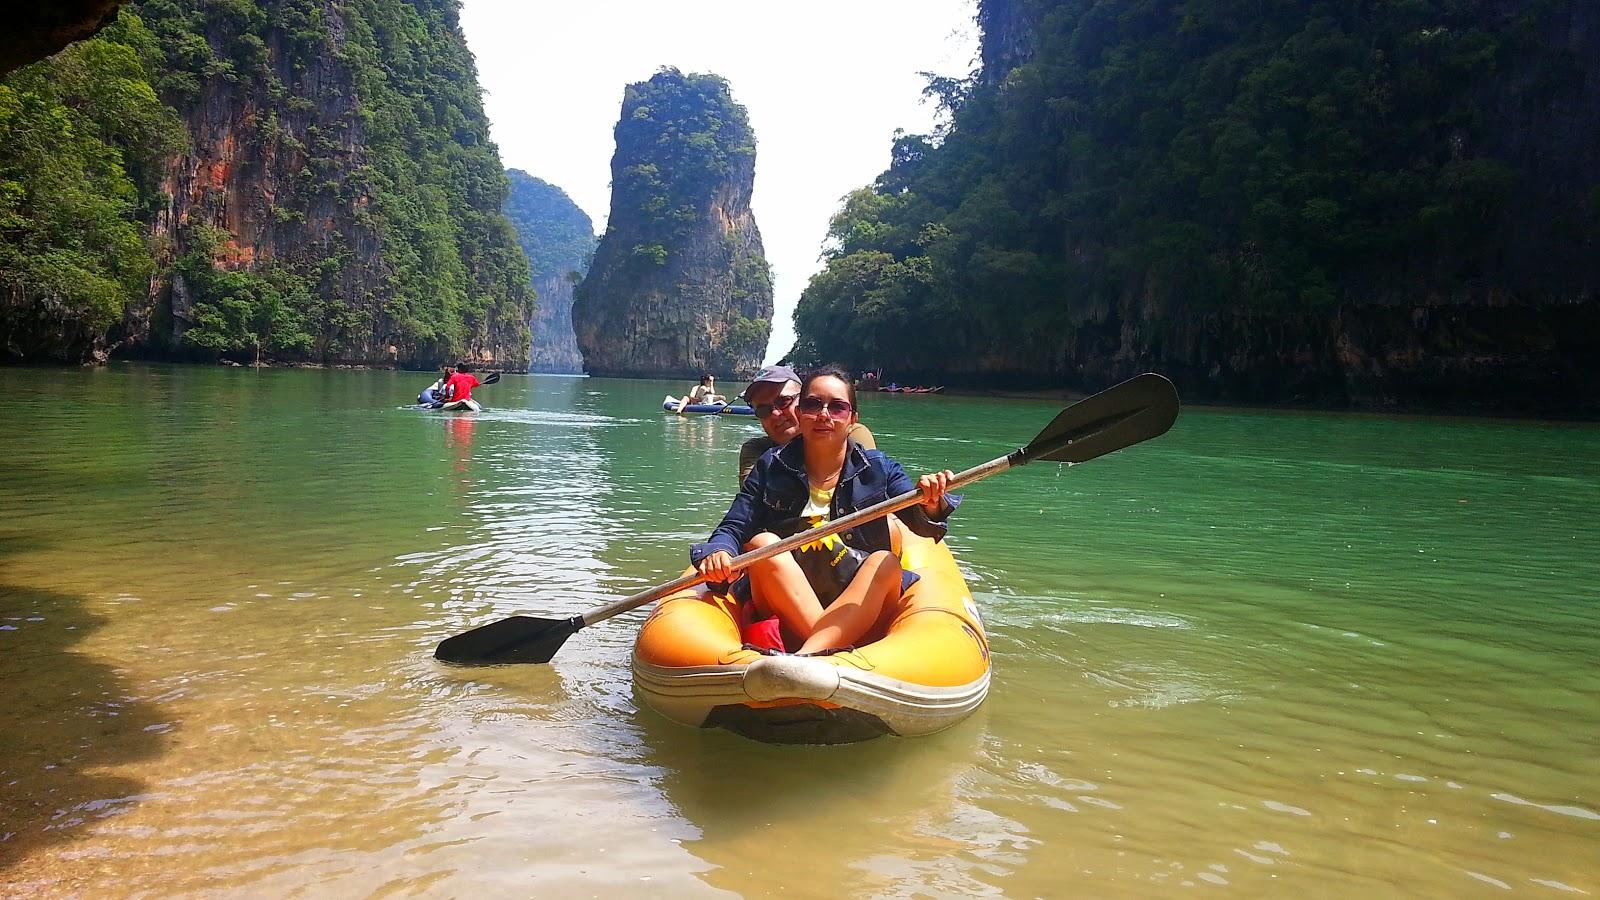 Sea canoe at James Bond island